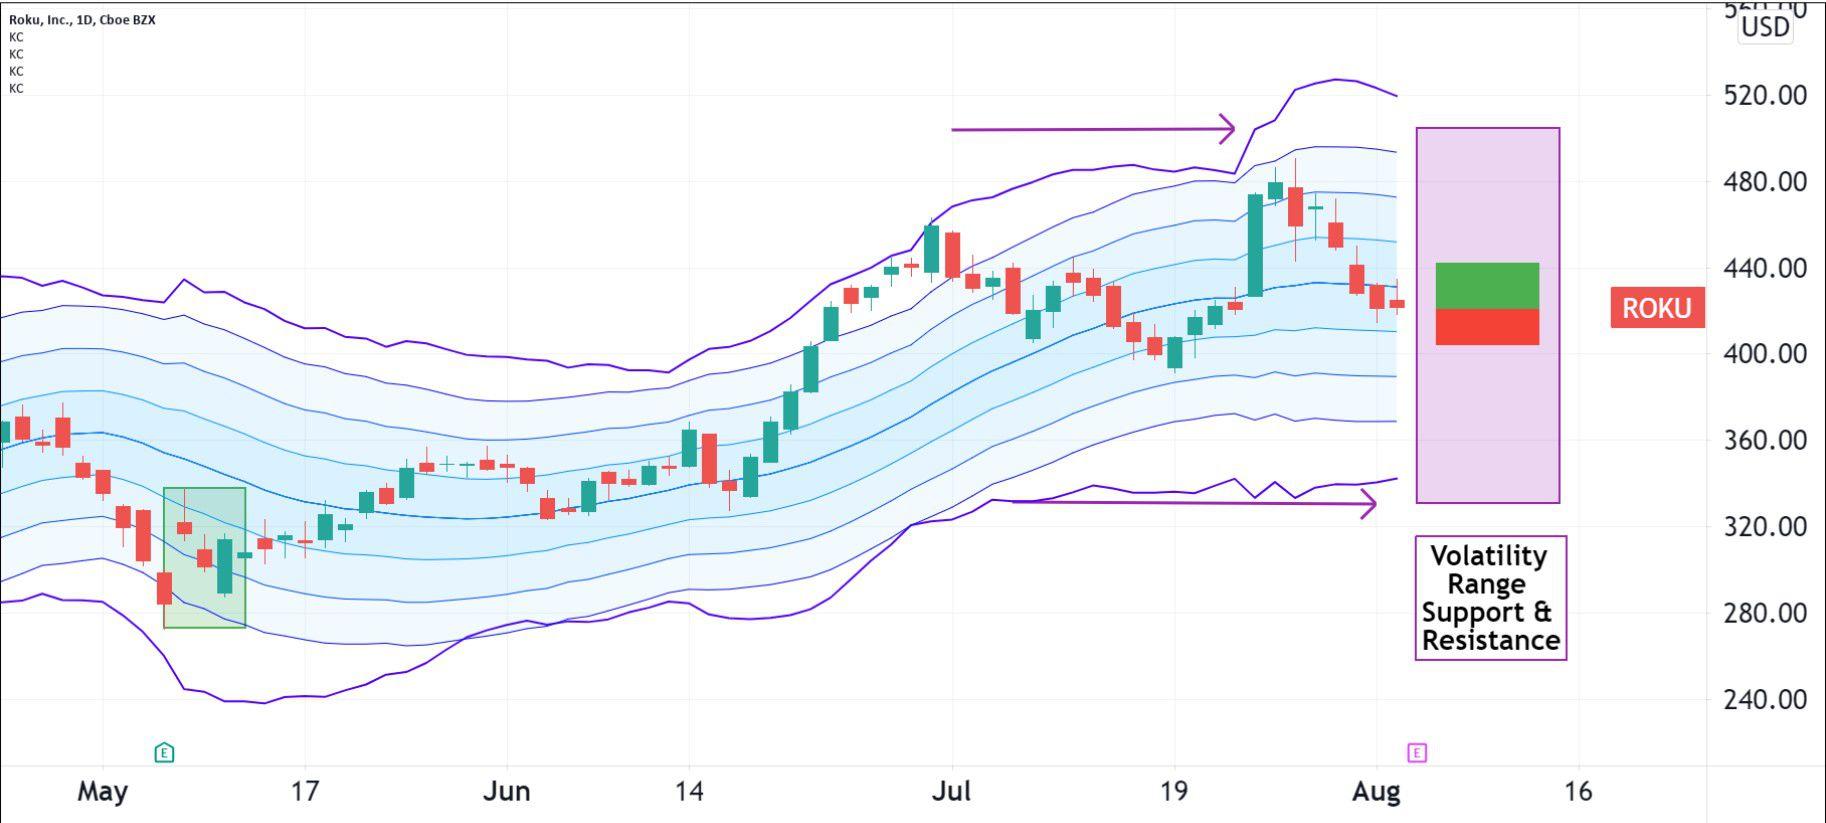 Volatility pattern for Roku, Inc. (ROKU)